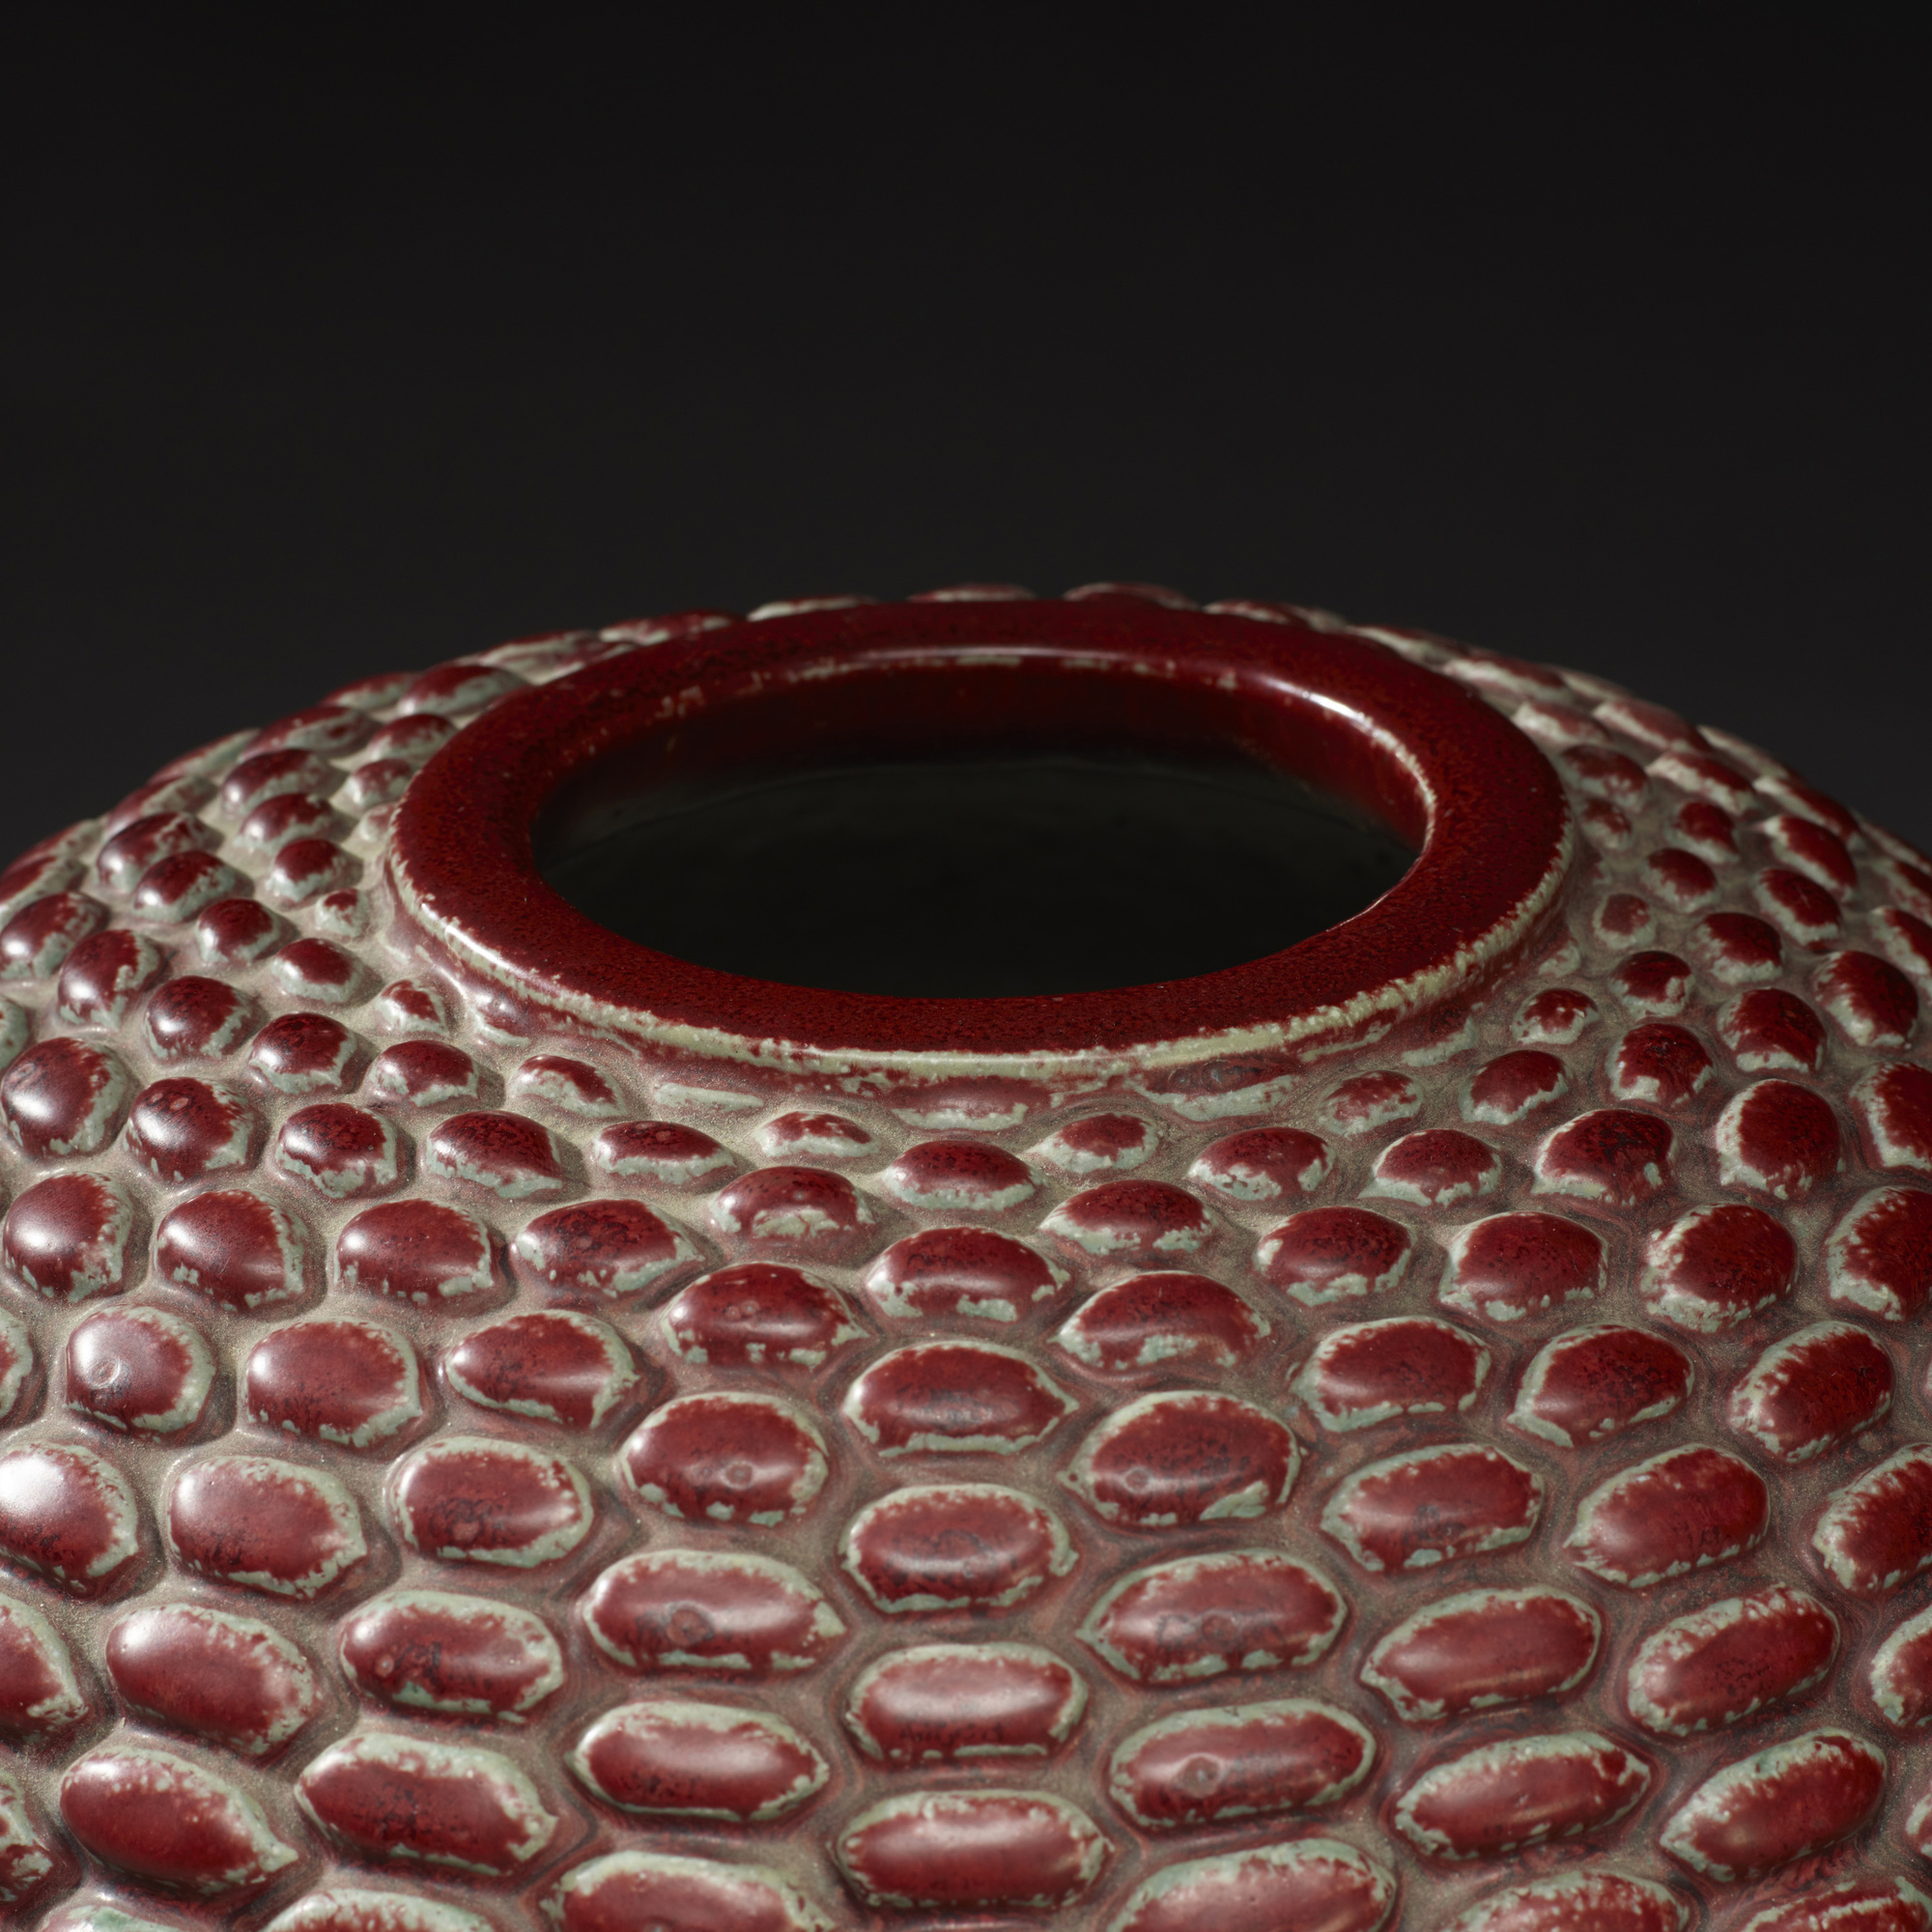 141: Axel Salto / Budding vase (2 of 2)